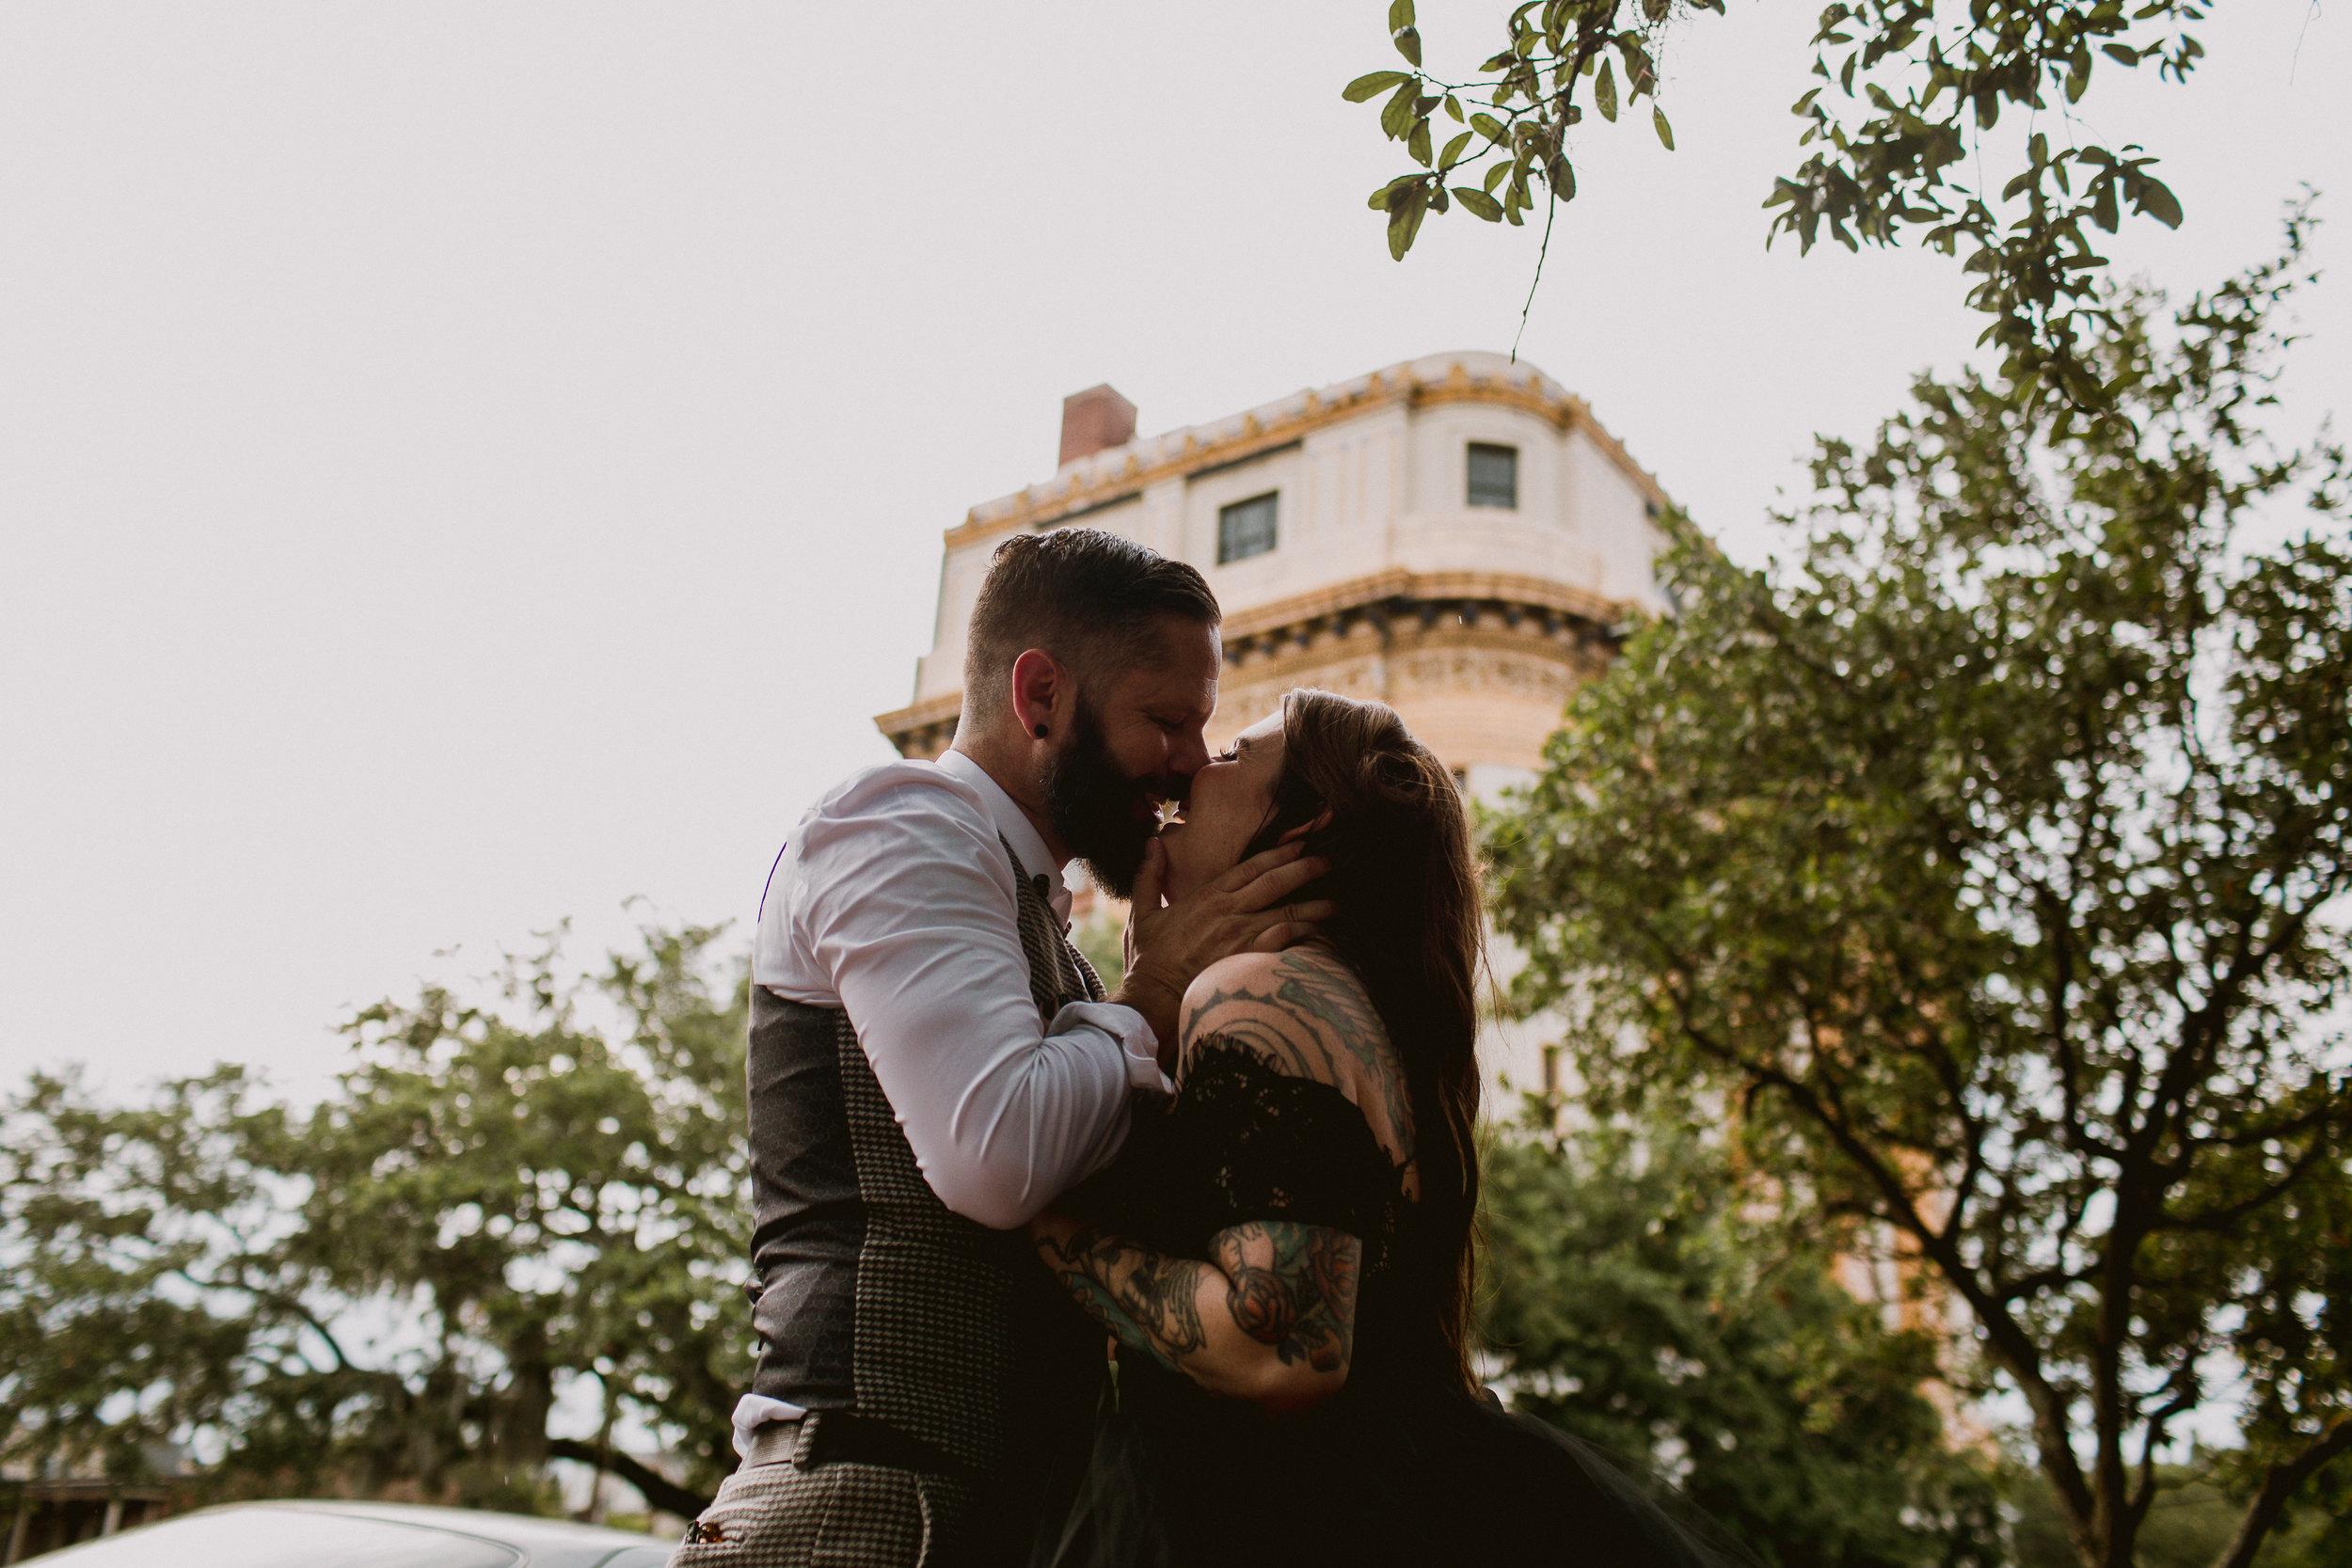 bohemian-hotel-savannah-elopement-kelley-raye-atlanta-wedding-photographer-134.jpg